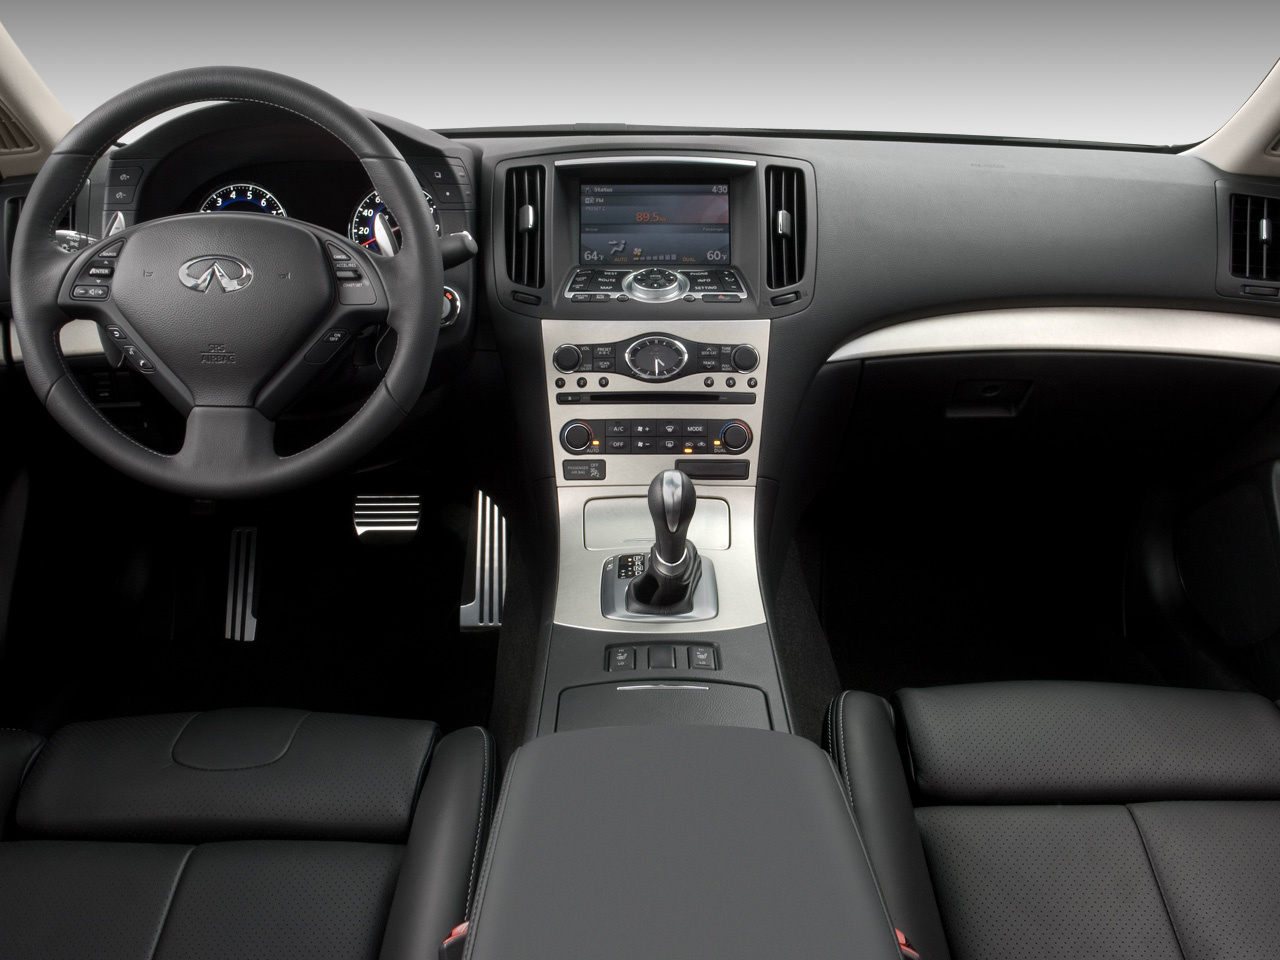 G35 0 60 >> 2007 Infiniti G35 - Road Test & Review - Automobile Magazine